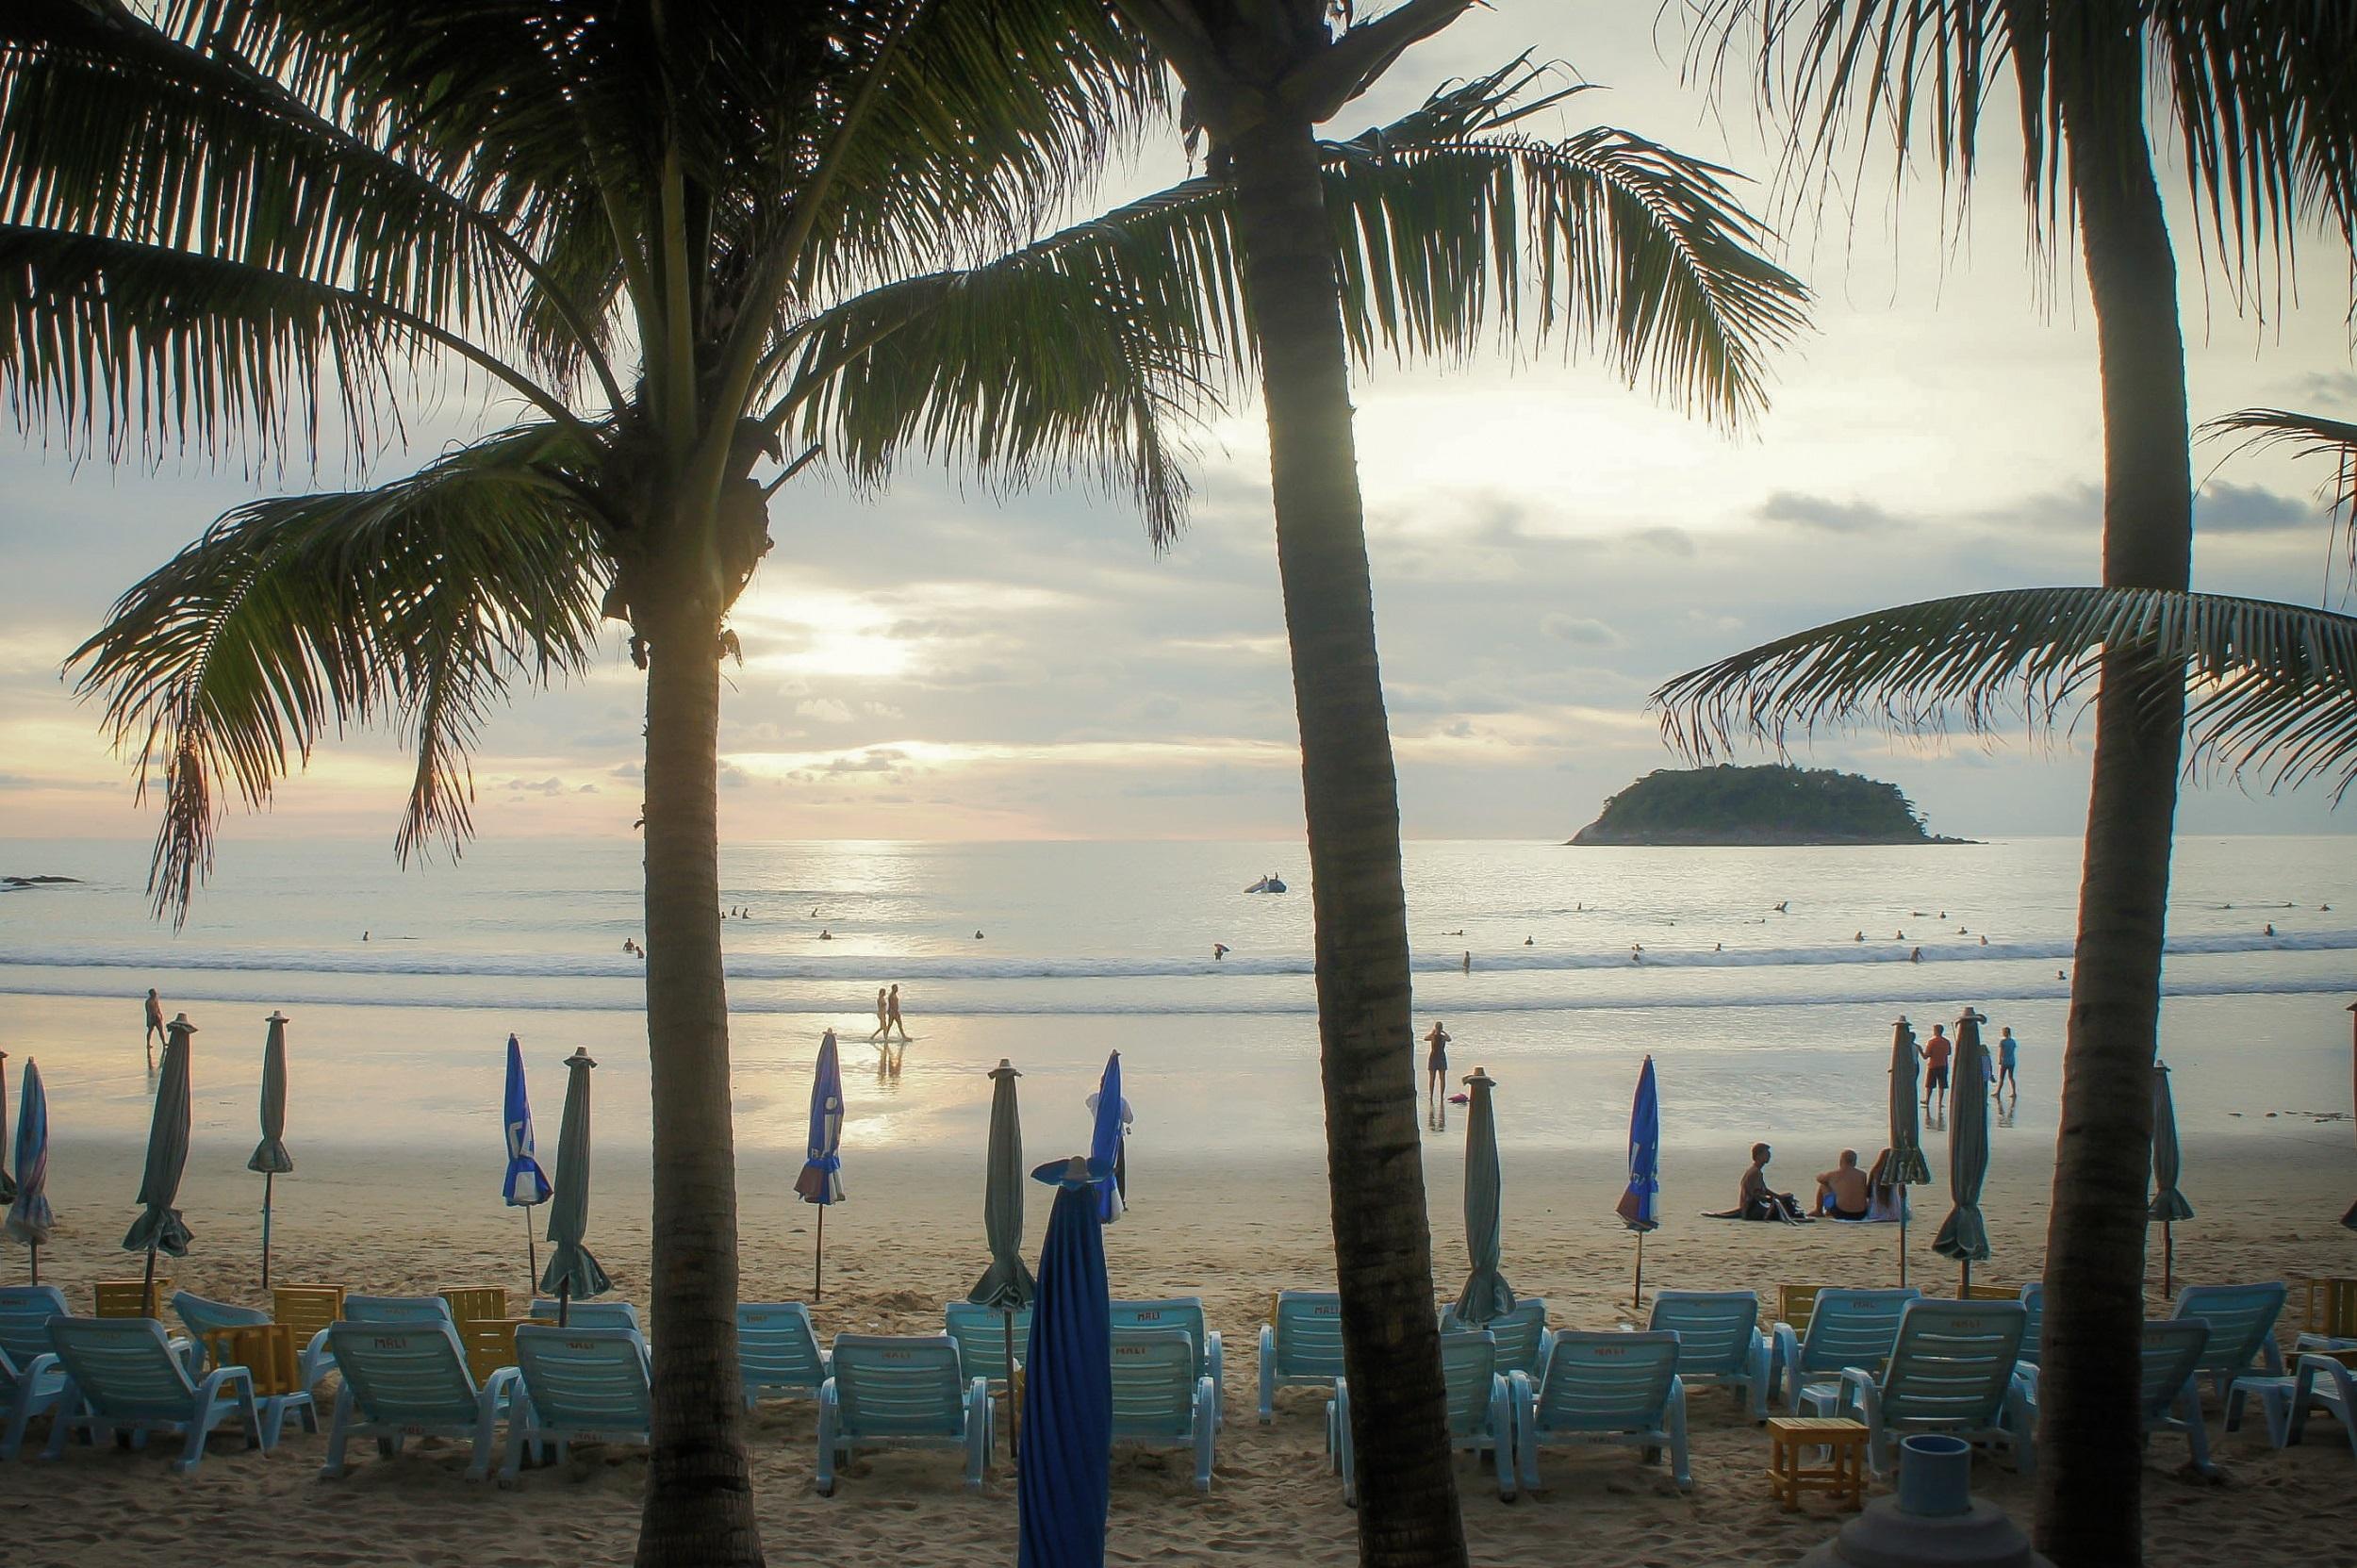 Tropical Beach, Seashore, Water, Shore, Sea, HQ Photo